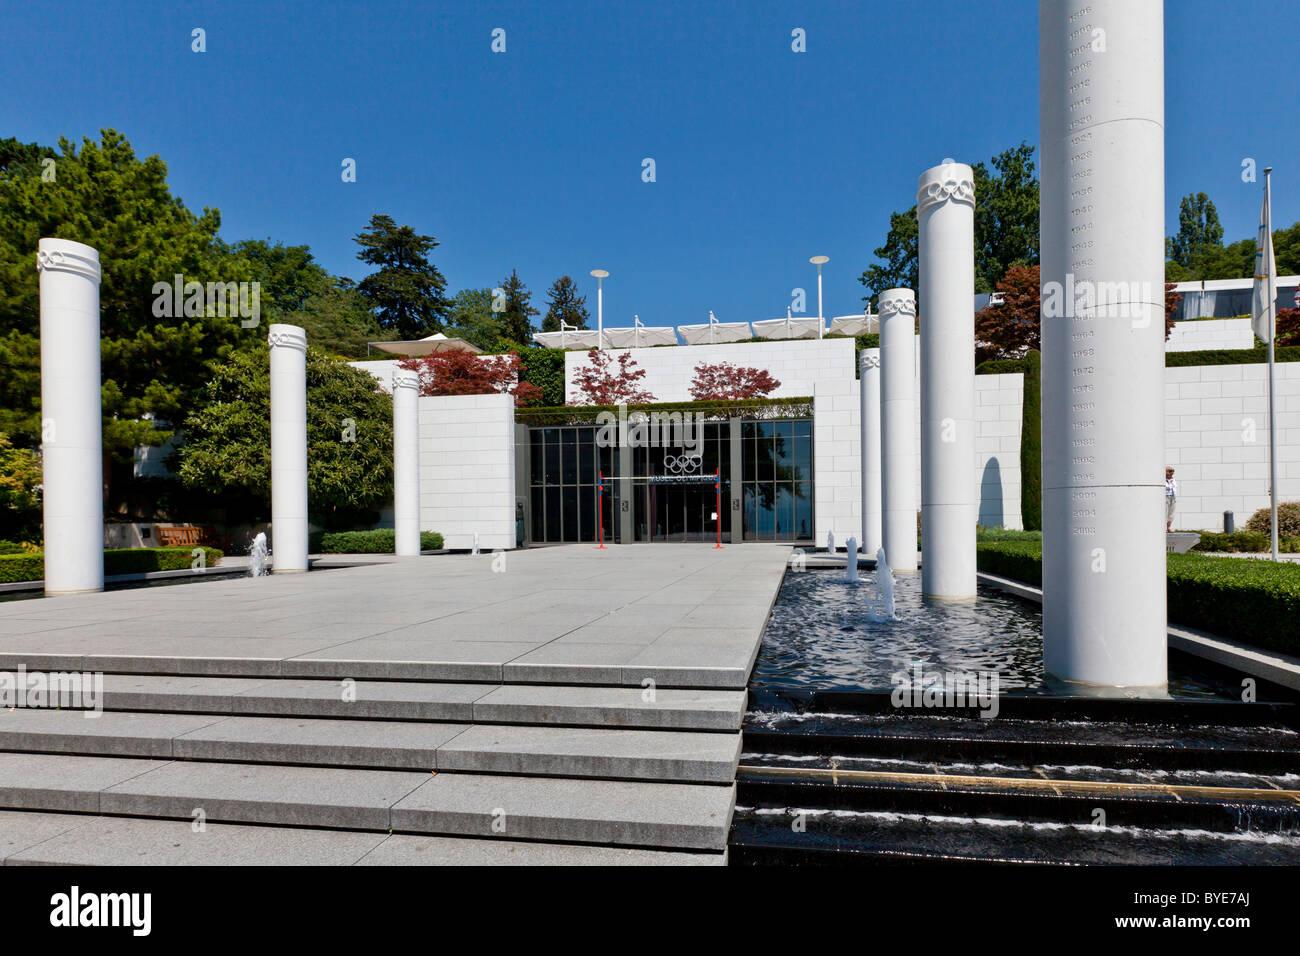 The Olympic Museum, opened in 1993 on the initiative of Juan Antonio Samaranch, Lausanne, Canton of Vaud, Lake Geneva - Stock Image